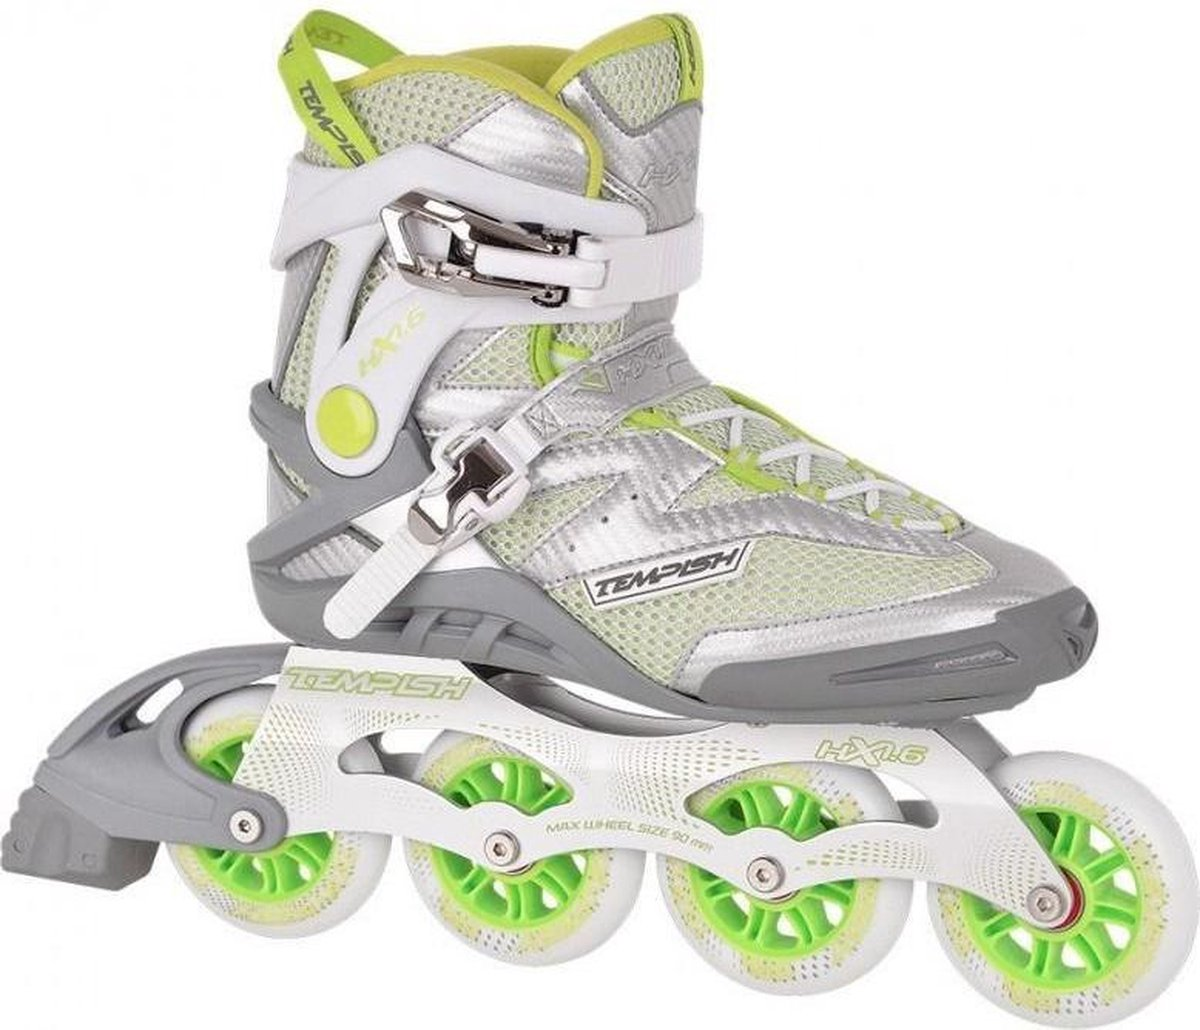 Skate - Tempish - HX 1.6 lady 90 silver-lime - dames - maat 38